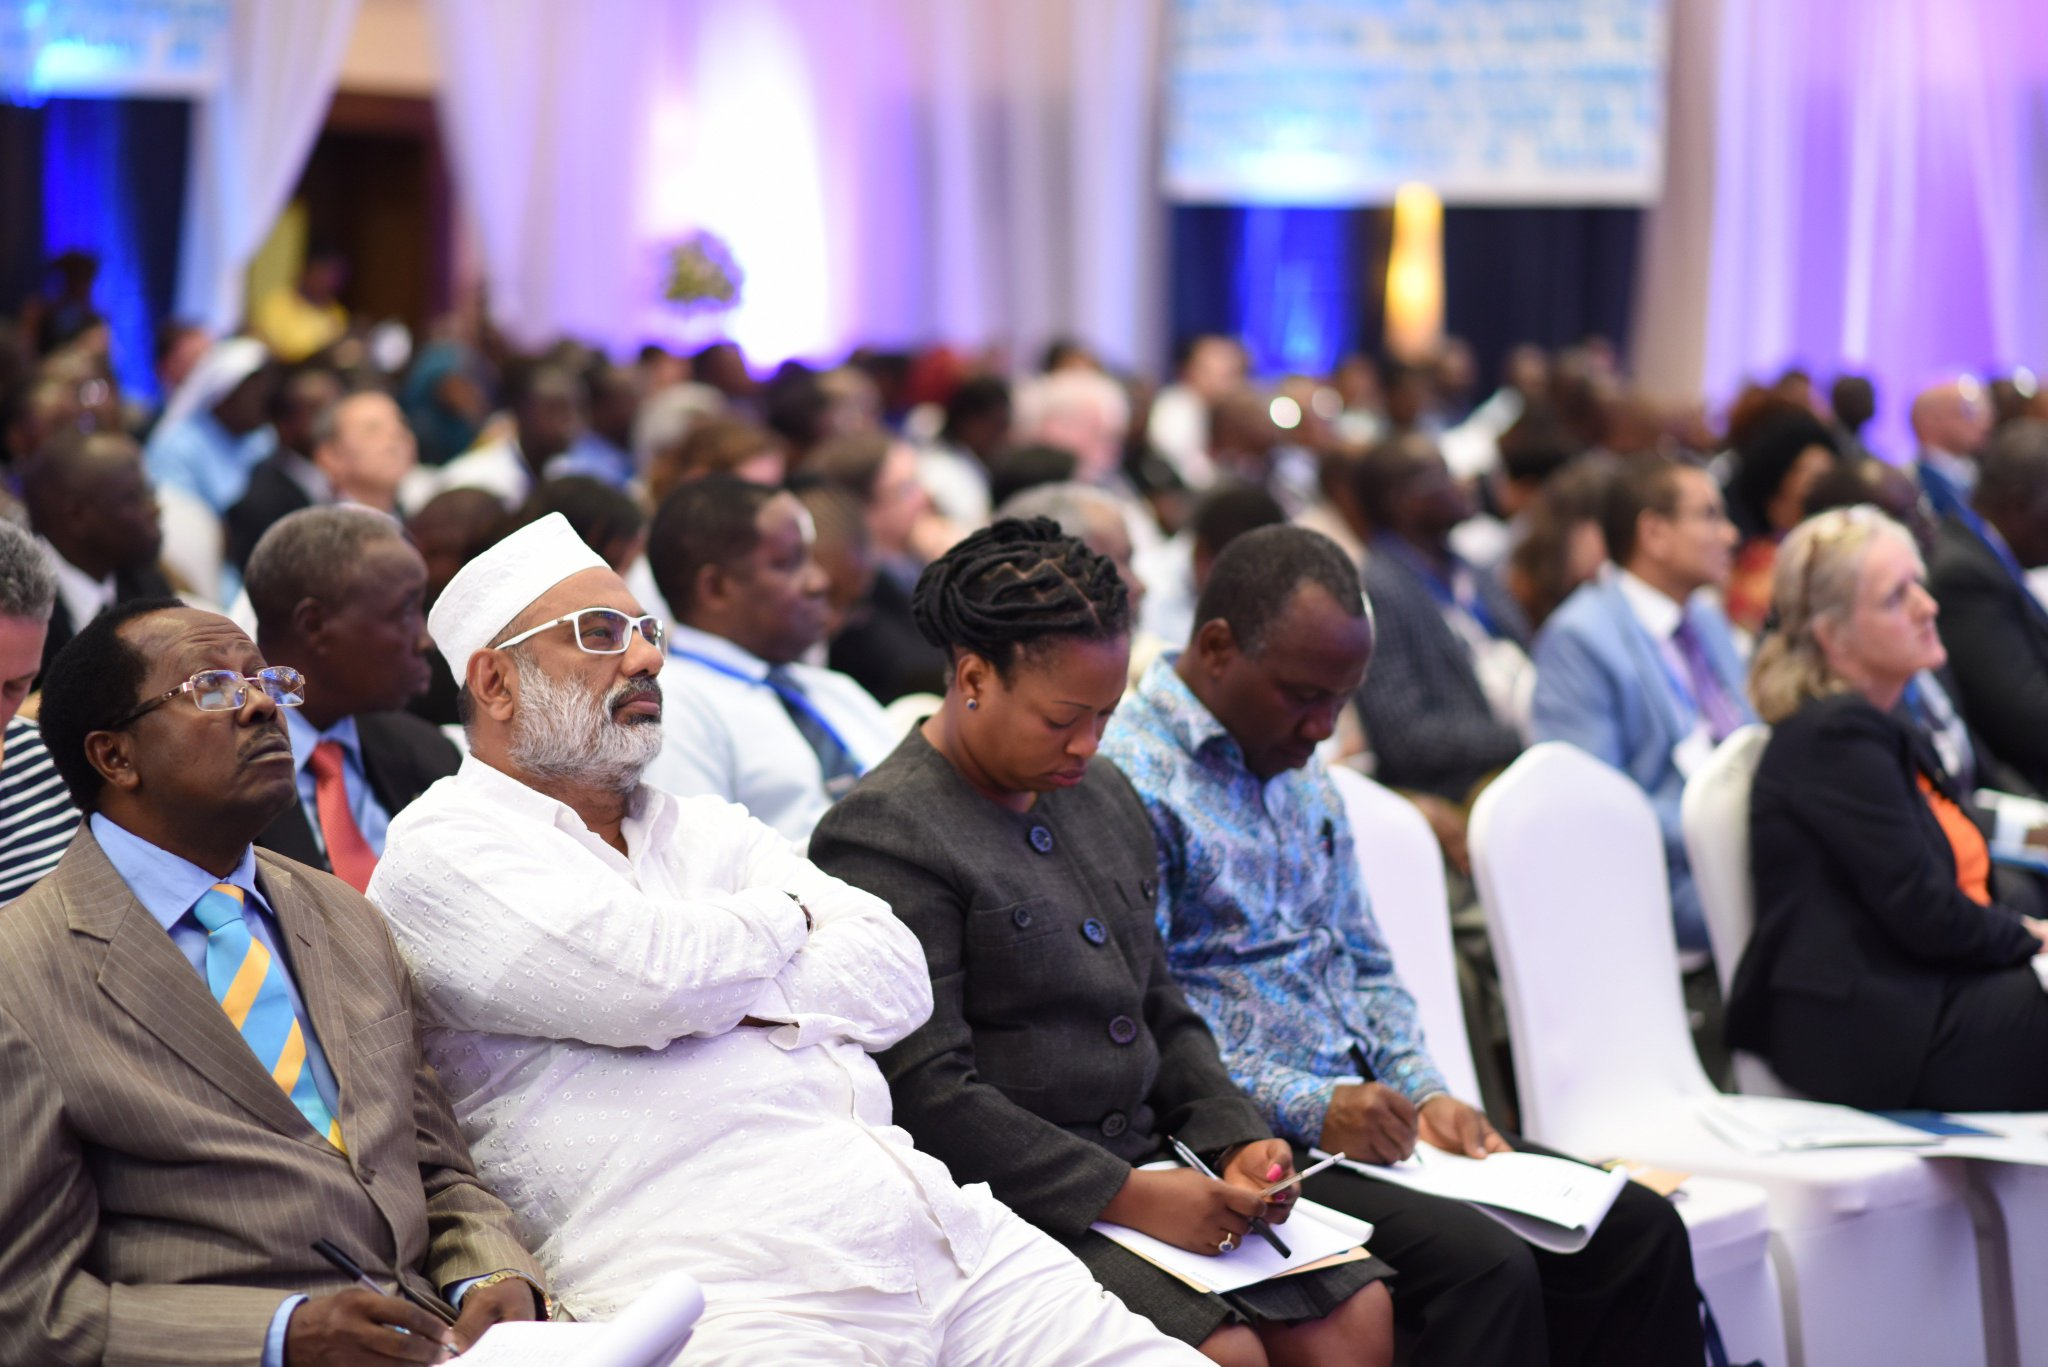 Thank you for participating actively online #ARW2017 @MariaSTsehai @DewjiFoundation @zittokabwe @Udadisi @The_IGC @CRDBBankPlc @EUinTZ https://t.co/ek8DaUr4t4